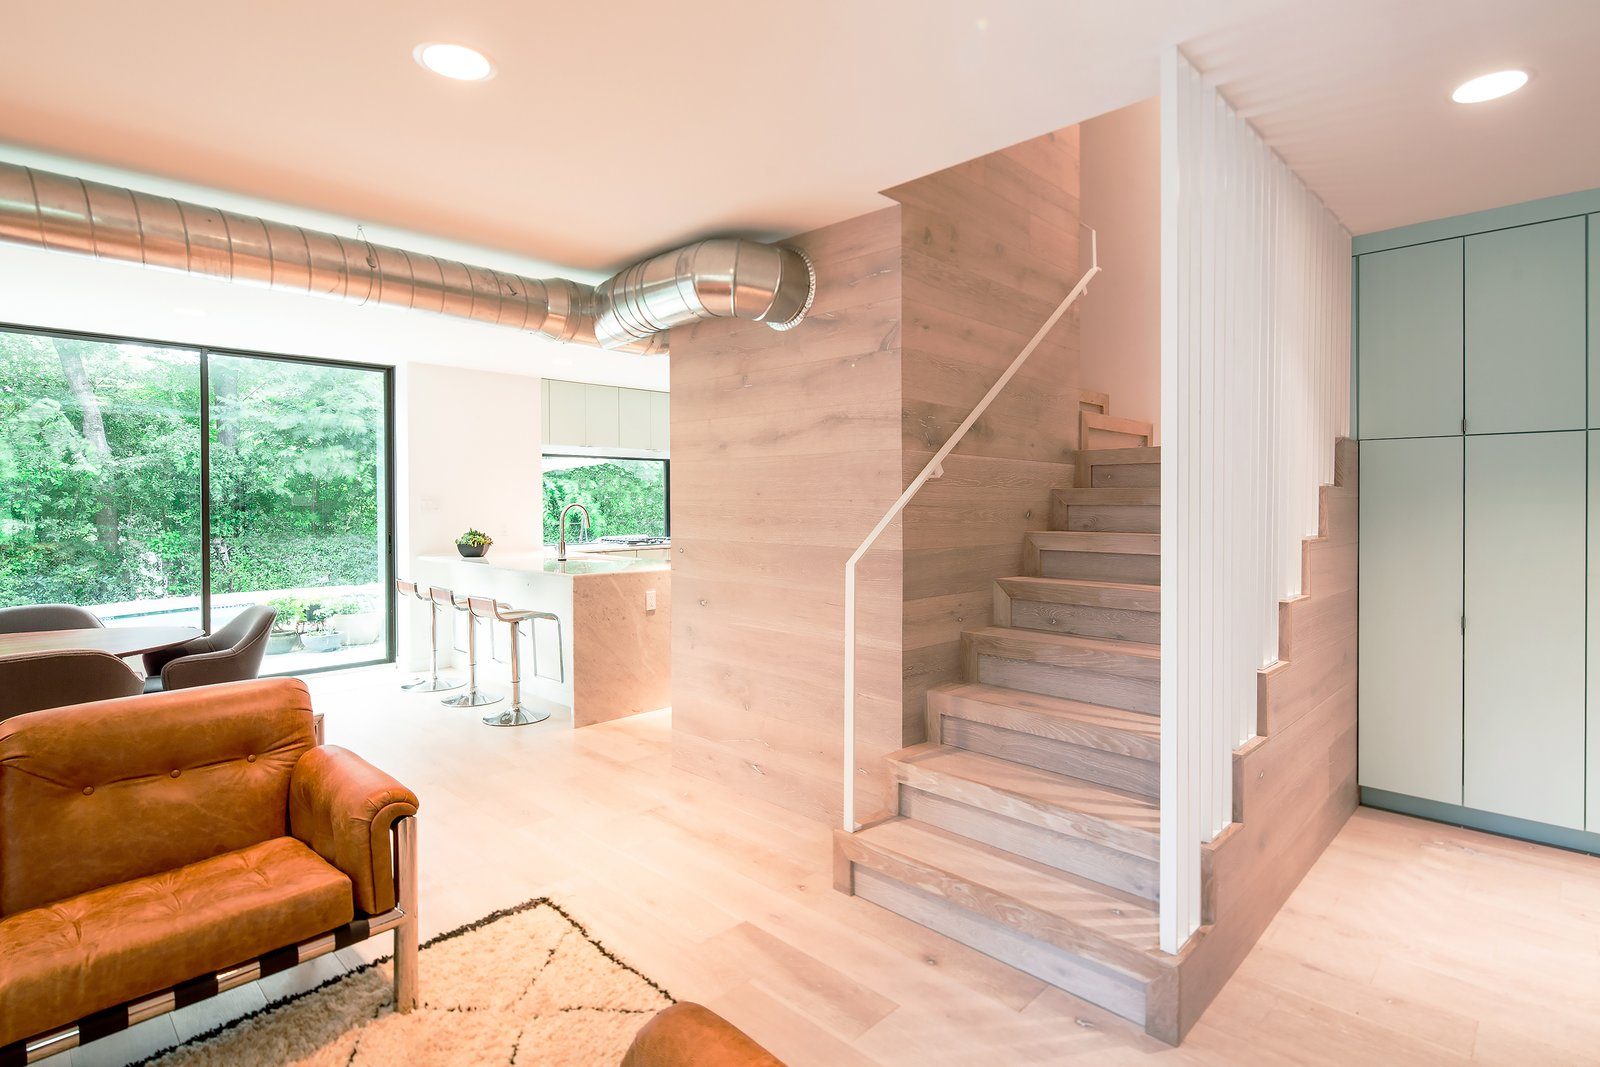 Sunnyvale Residence by un.box studio